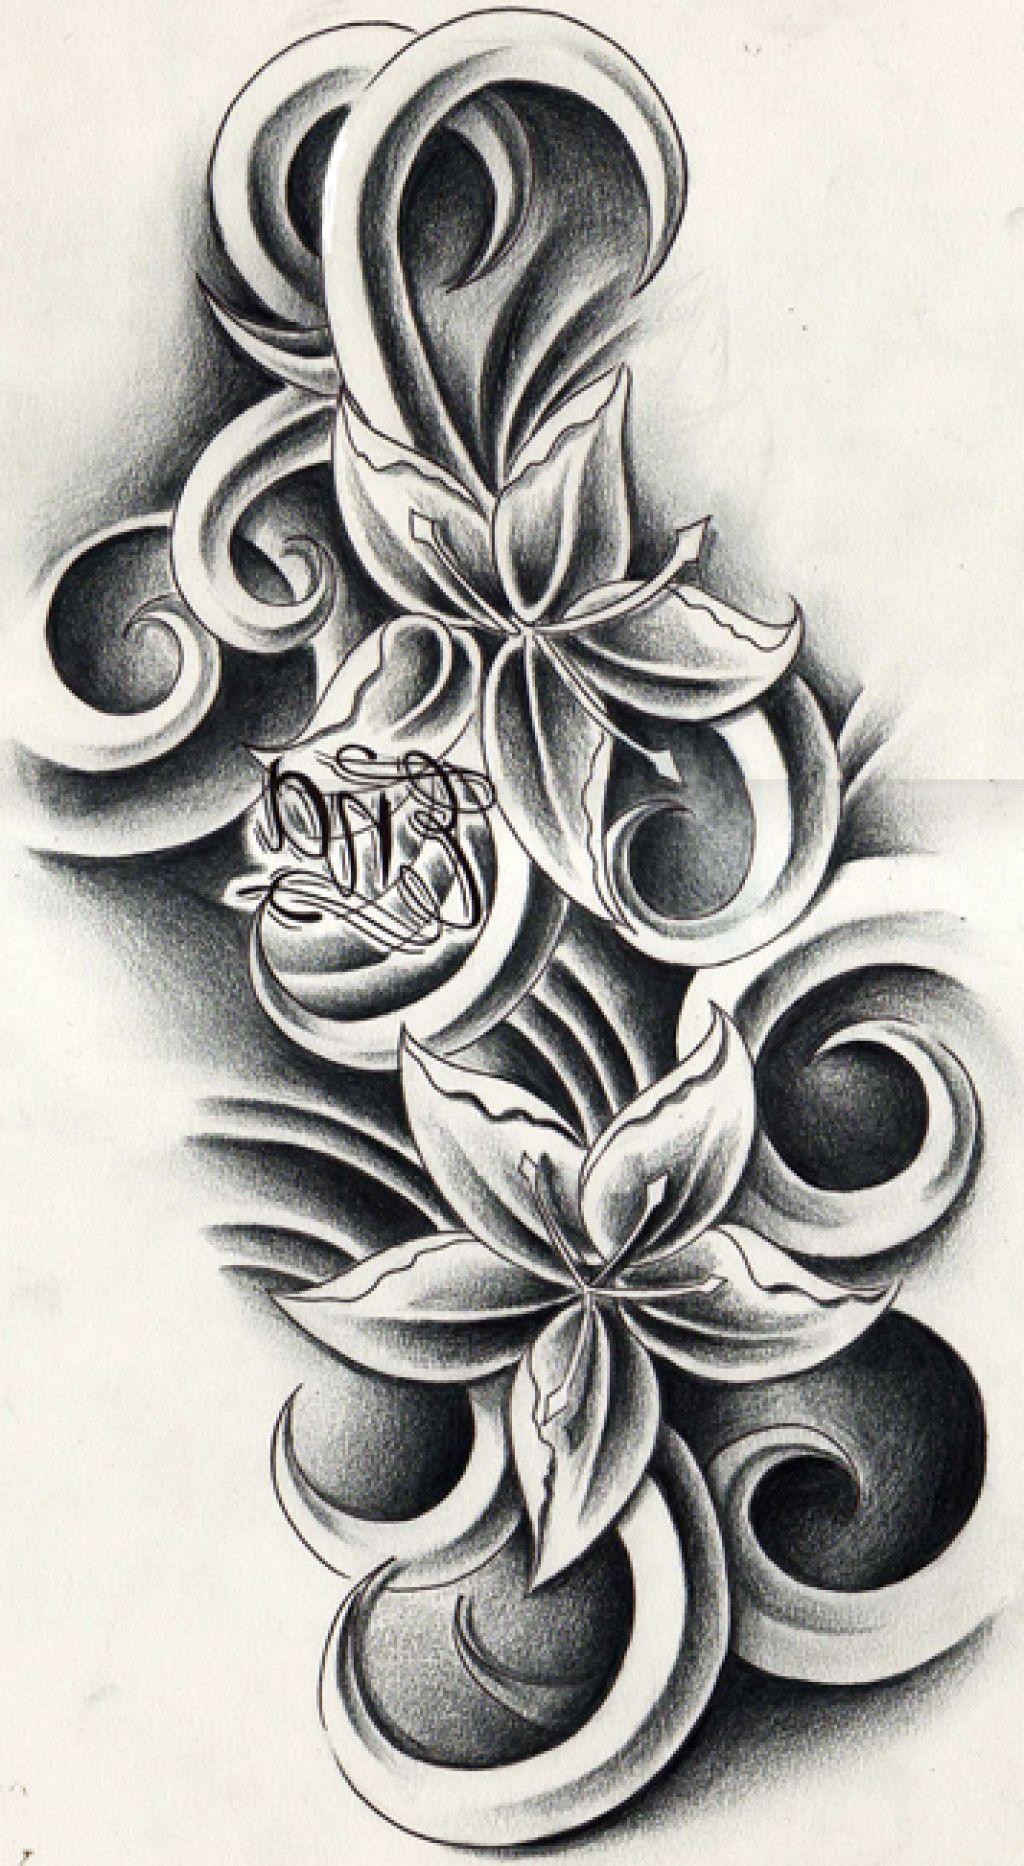 honeysuckle flower tattoos google search ink pinterest flower tattoos tattoo and tatoos. Black Bedroom Furniture Sets. Home Design Ideas